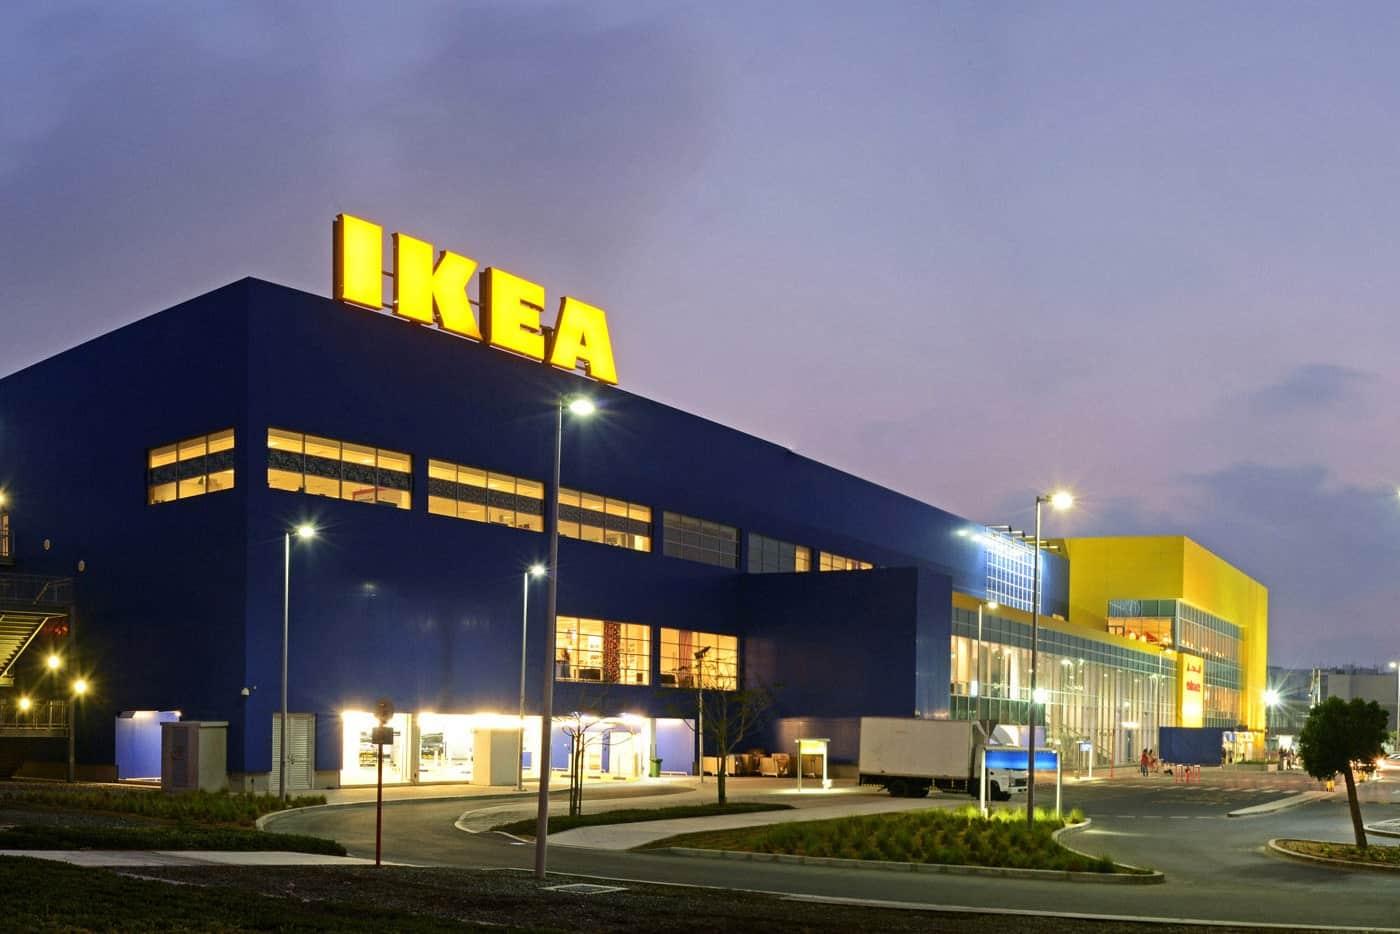 magasin ikea ouvert le 11 novembre 2020